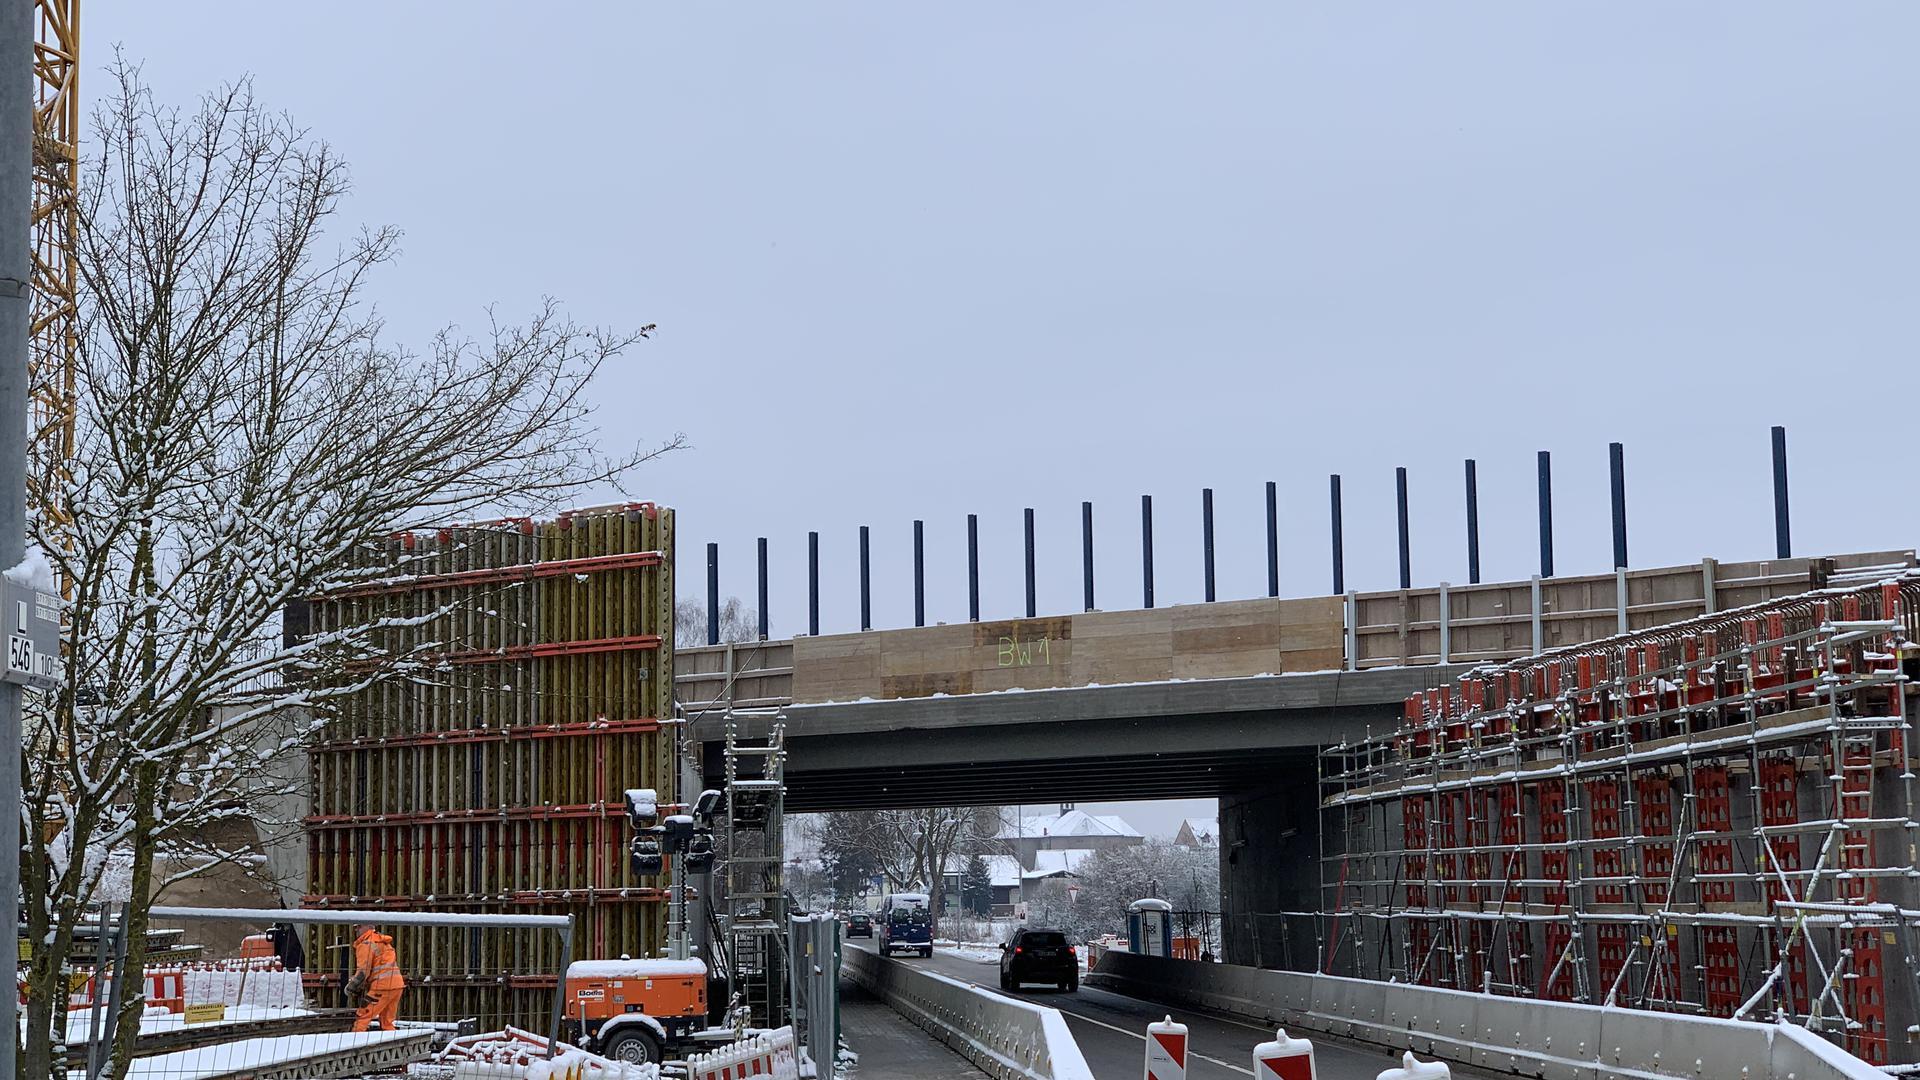 Baustelle an einer Brücke